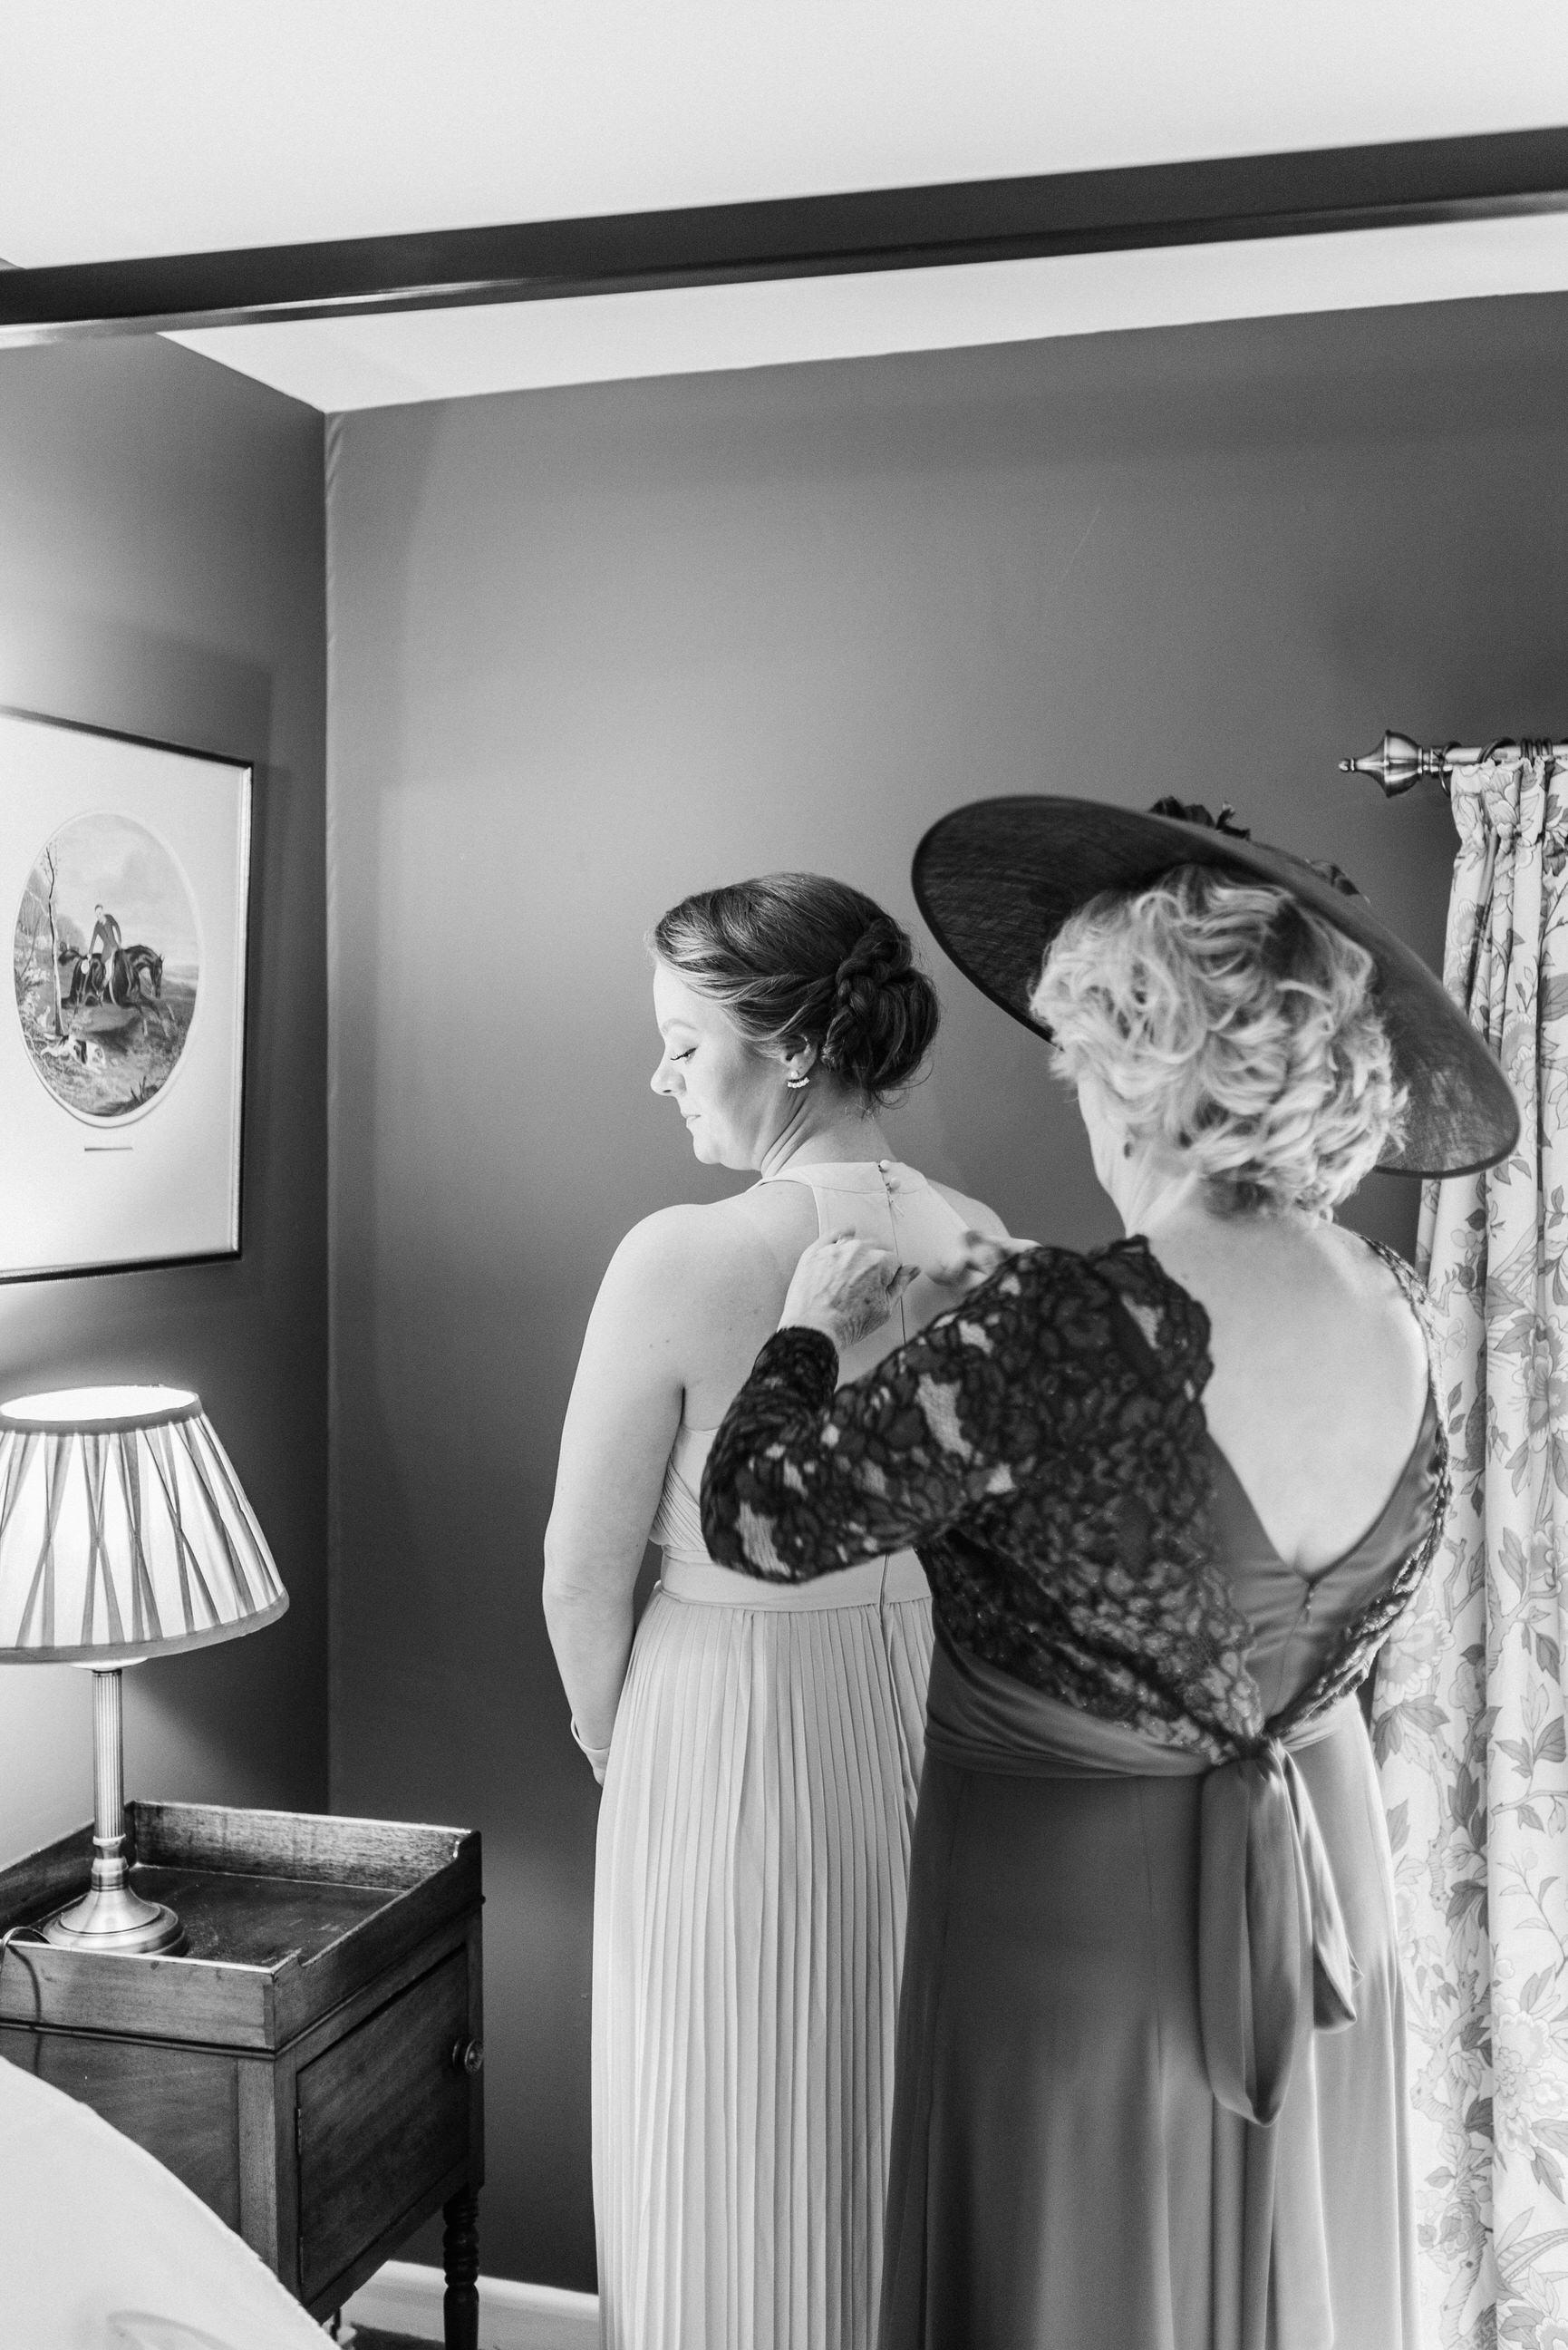 lissanoure castle wedding, northern ireland wedding photographer, romantic northern irish wedding venue, castle wedding ireland, natural wedding photography ni (26).jpg